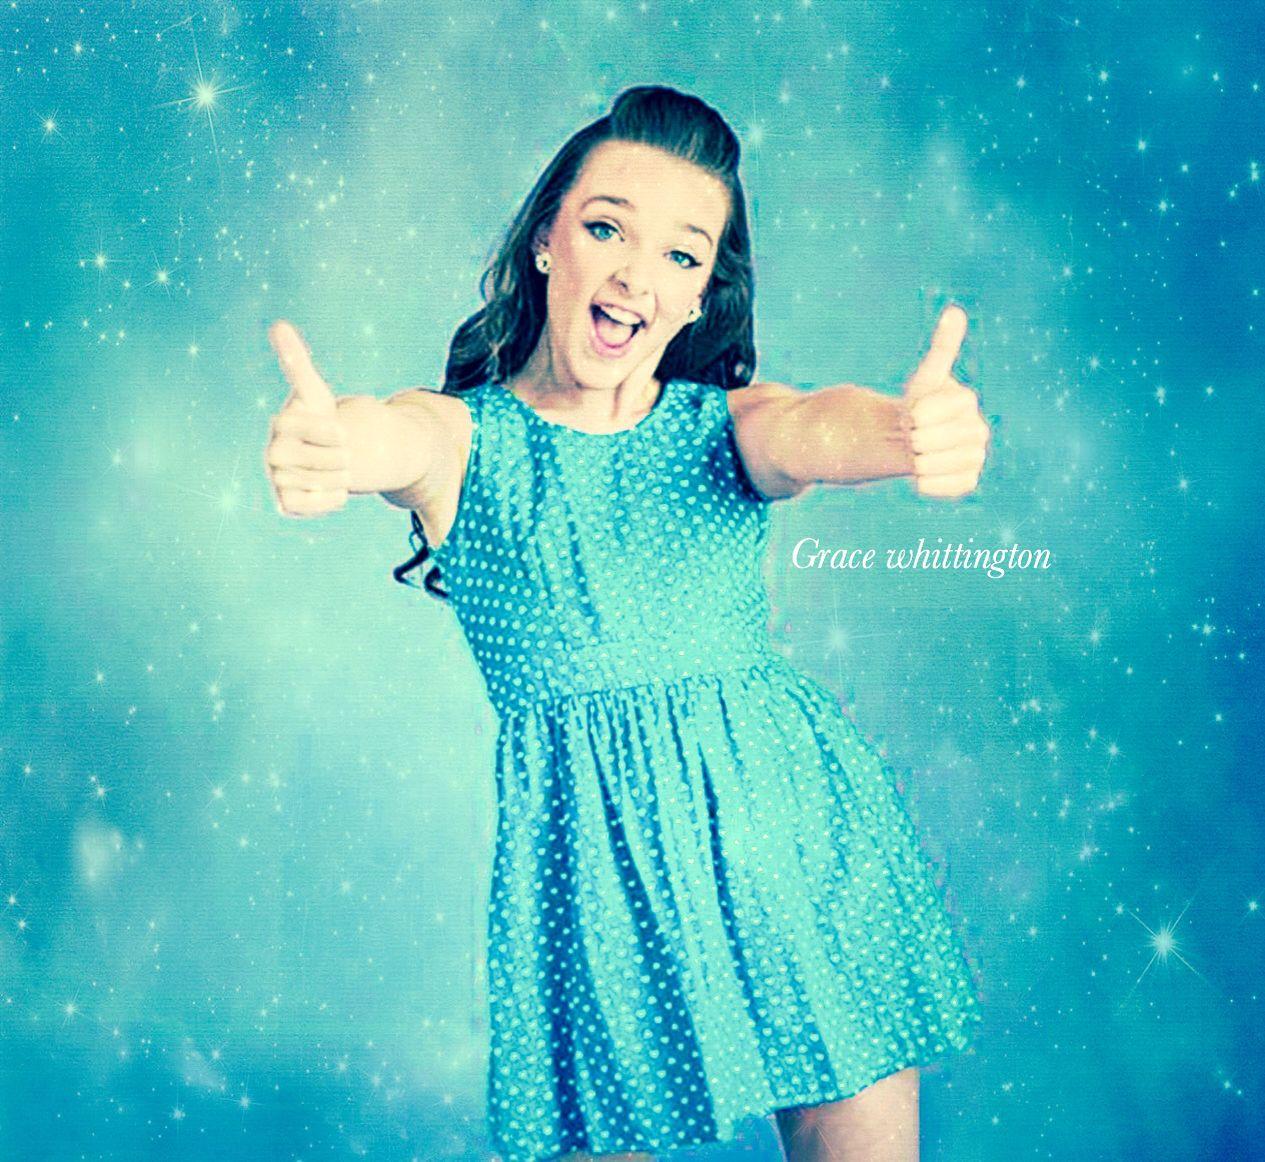 Luv u Kendall! @gracewhittington